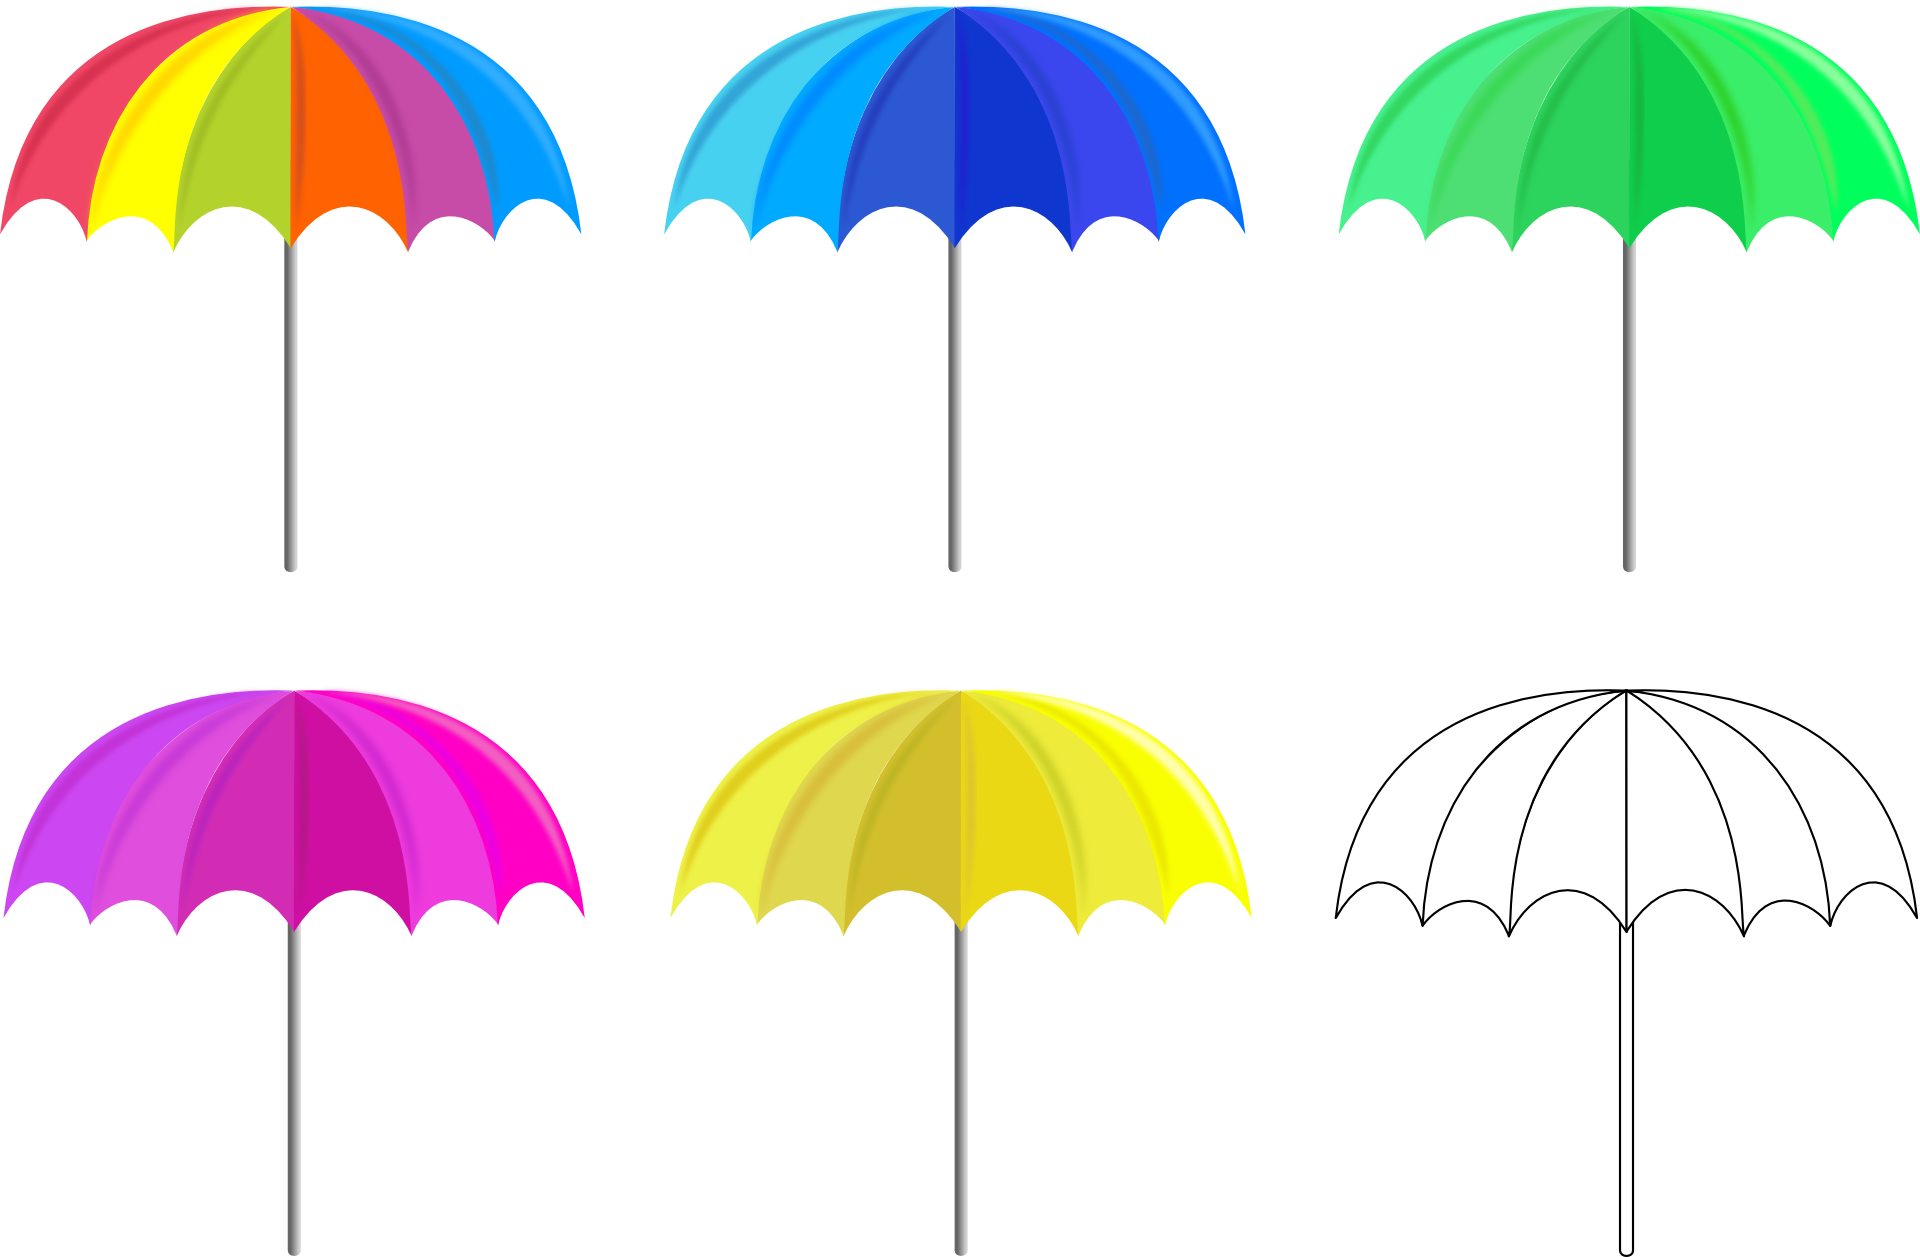 Colorful Umbrella PNG Image